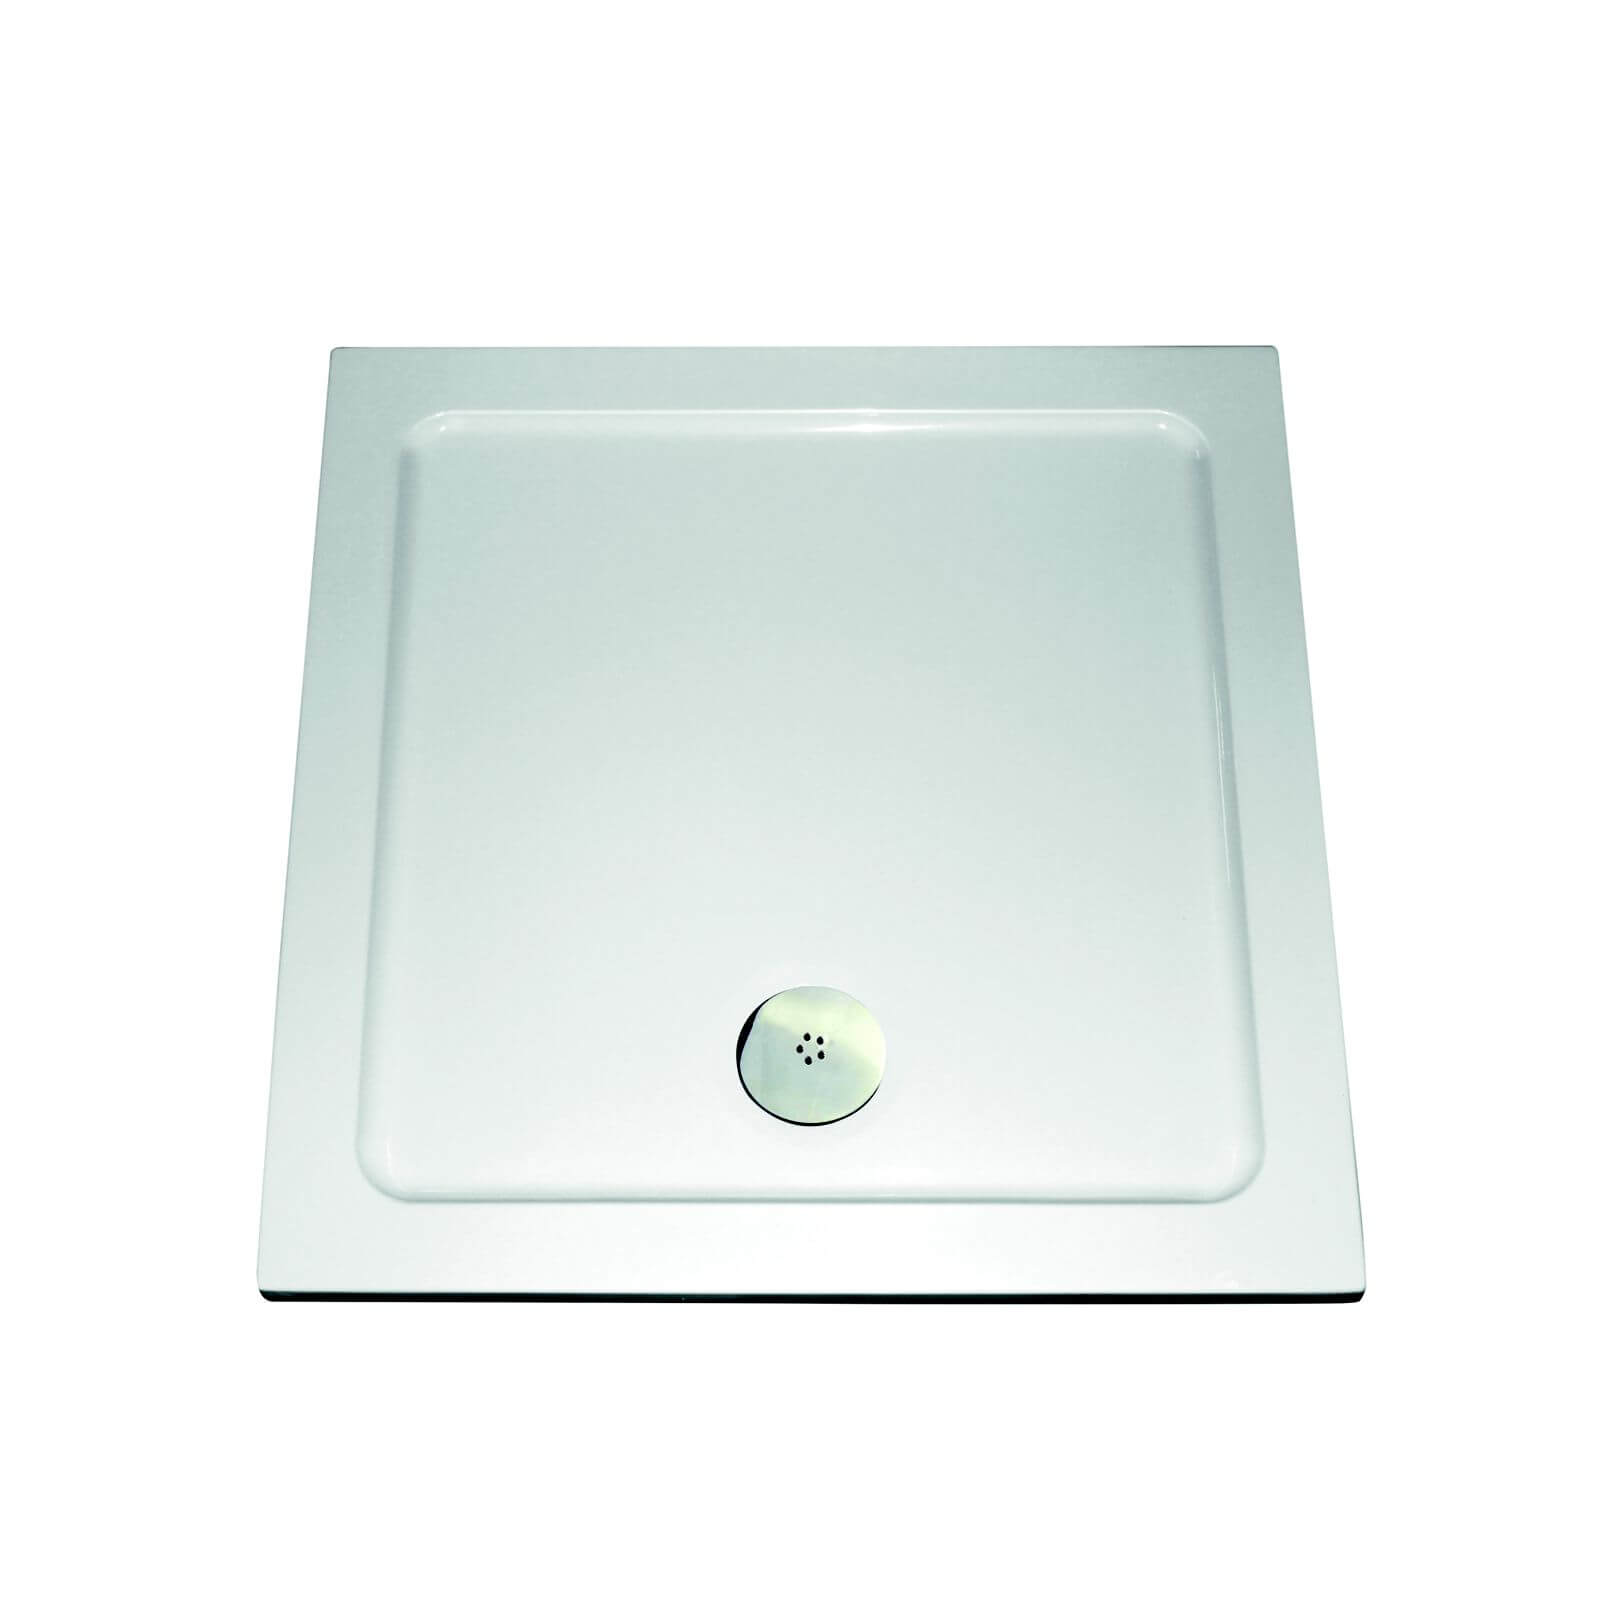 Aqualux Square Shower Tray - 900 x 900 x 35mm